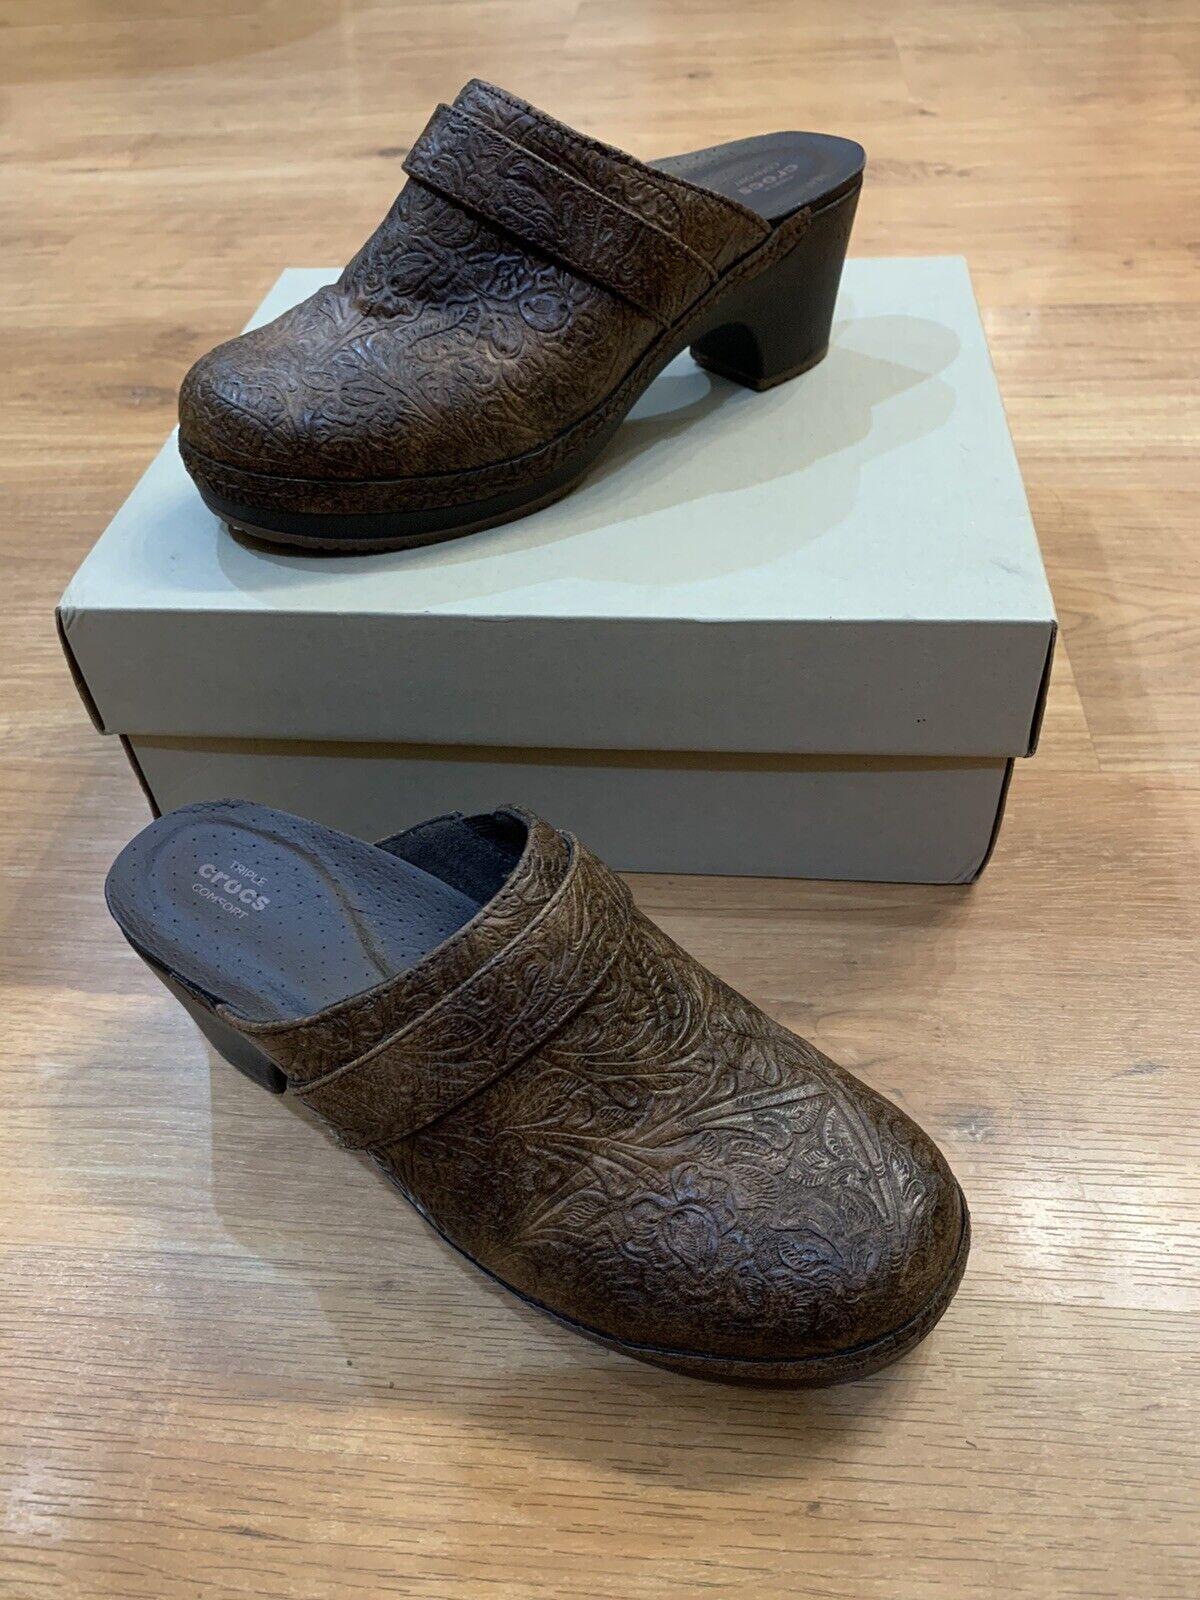 Crocs Sarah Tooled Clog Brown Triple Comfort Slip On Shoes 203911 Women's Size 7